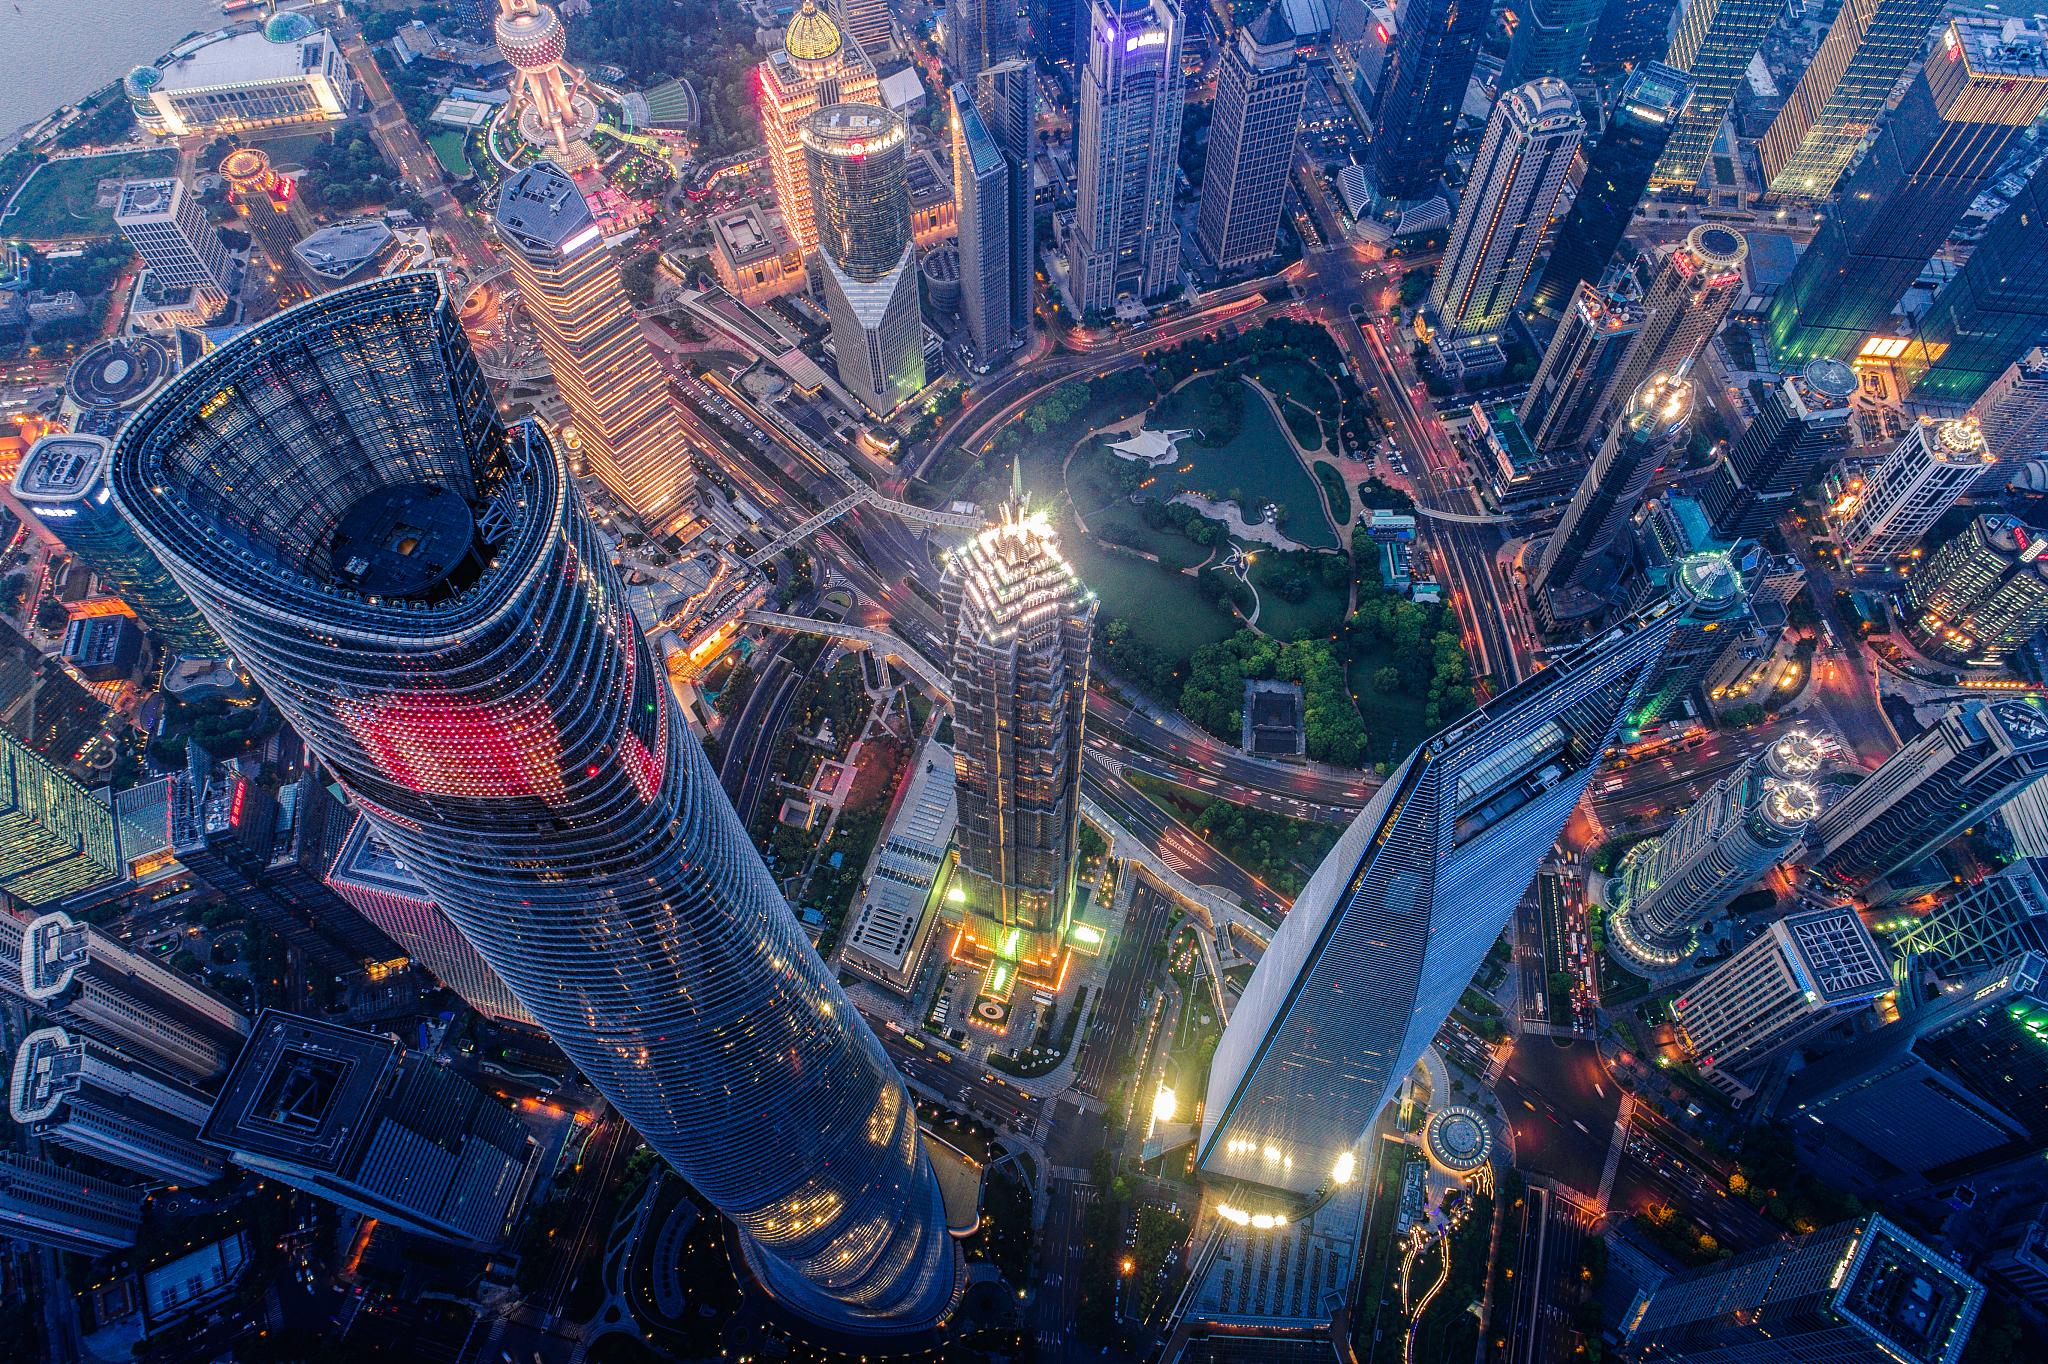 Shanghai Tower Observation Deck Ticket | Trip.com